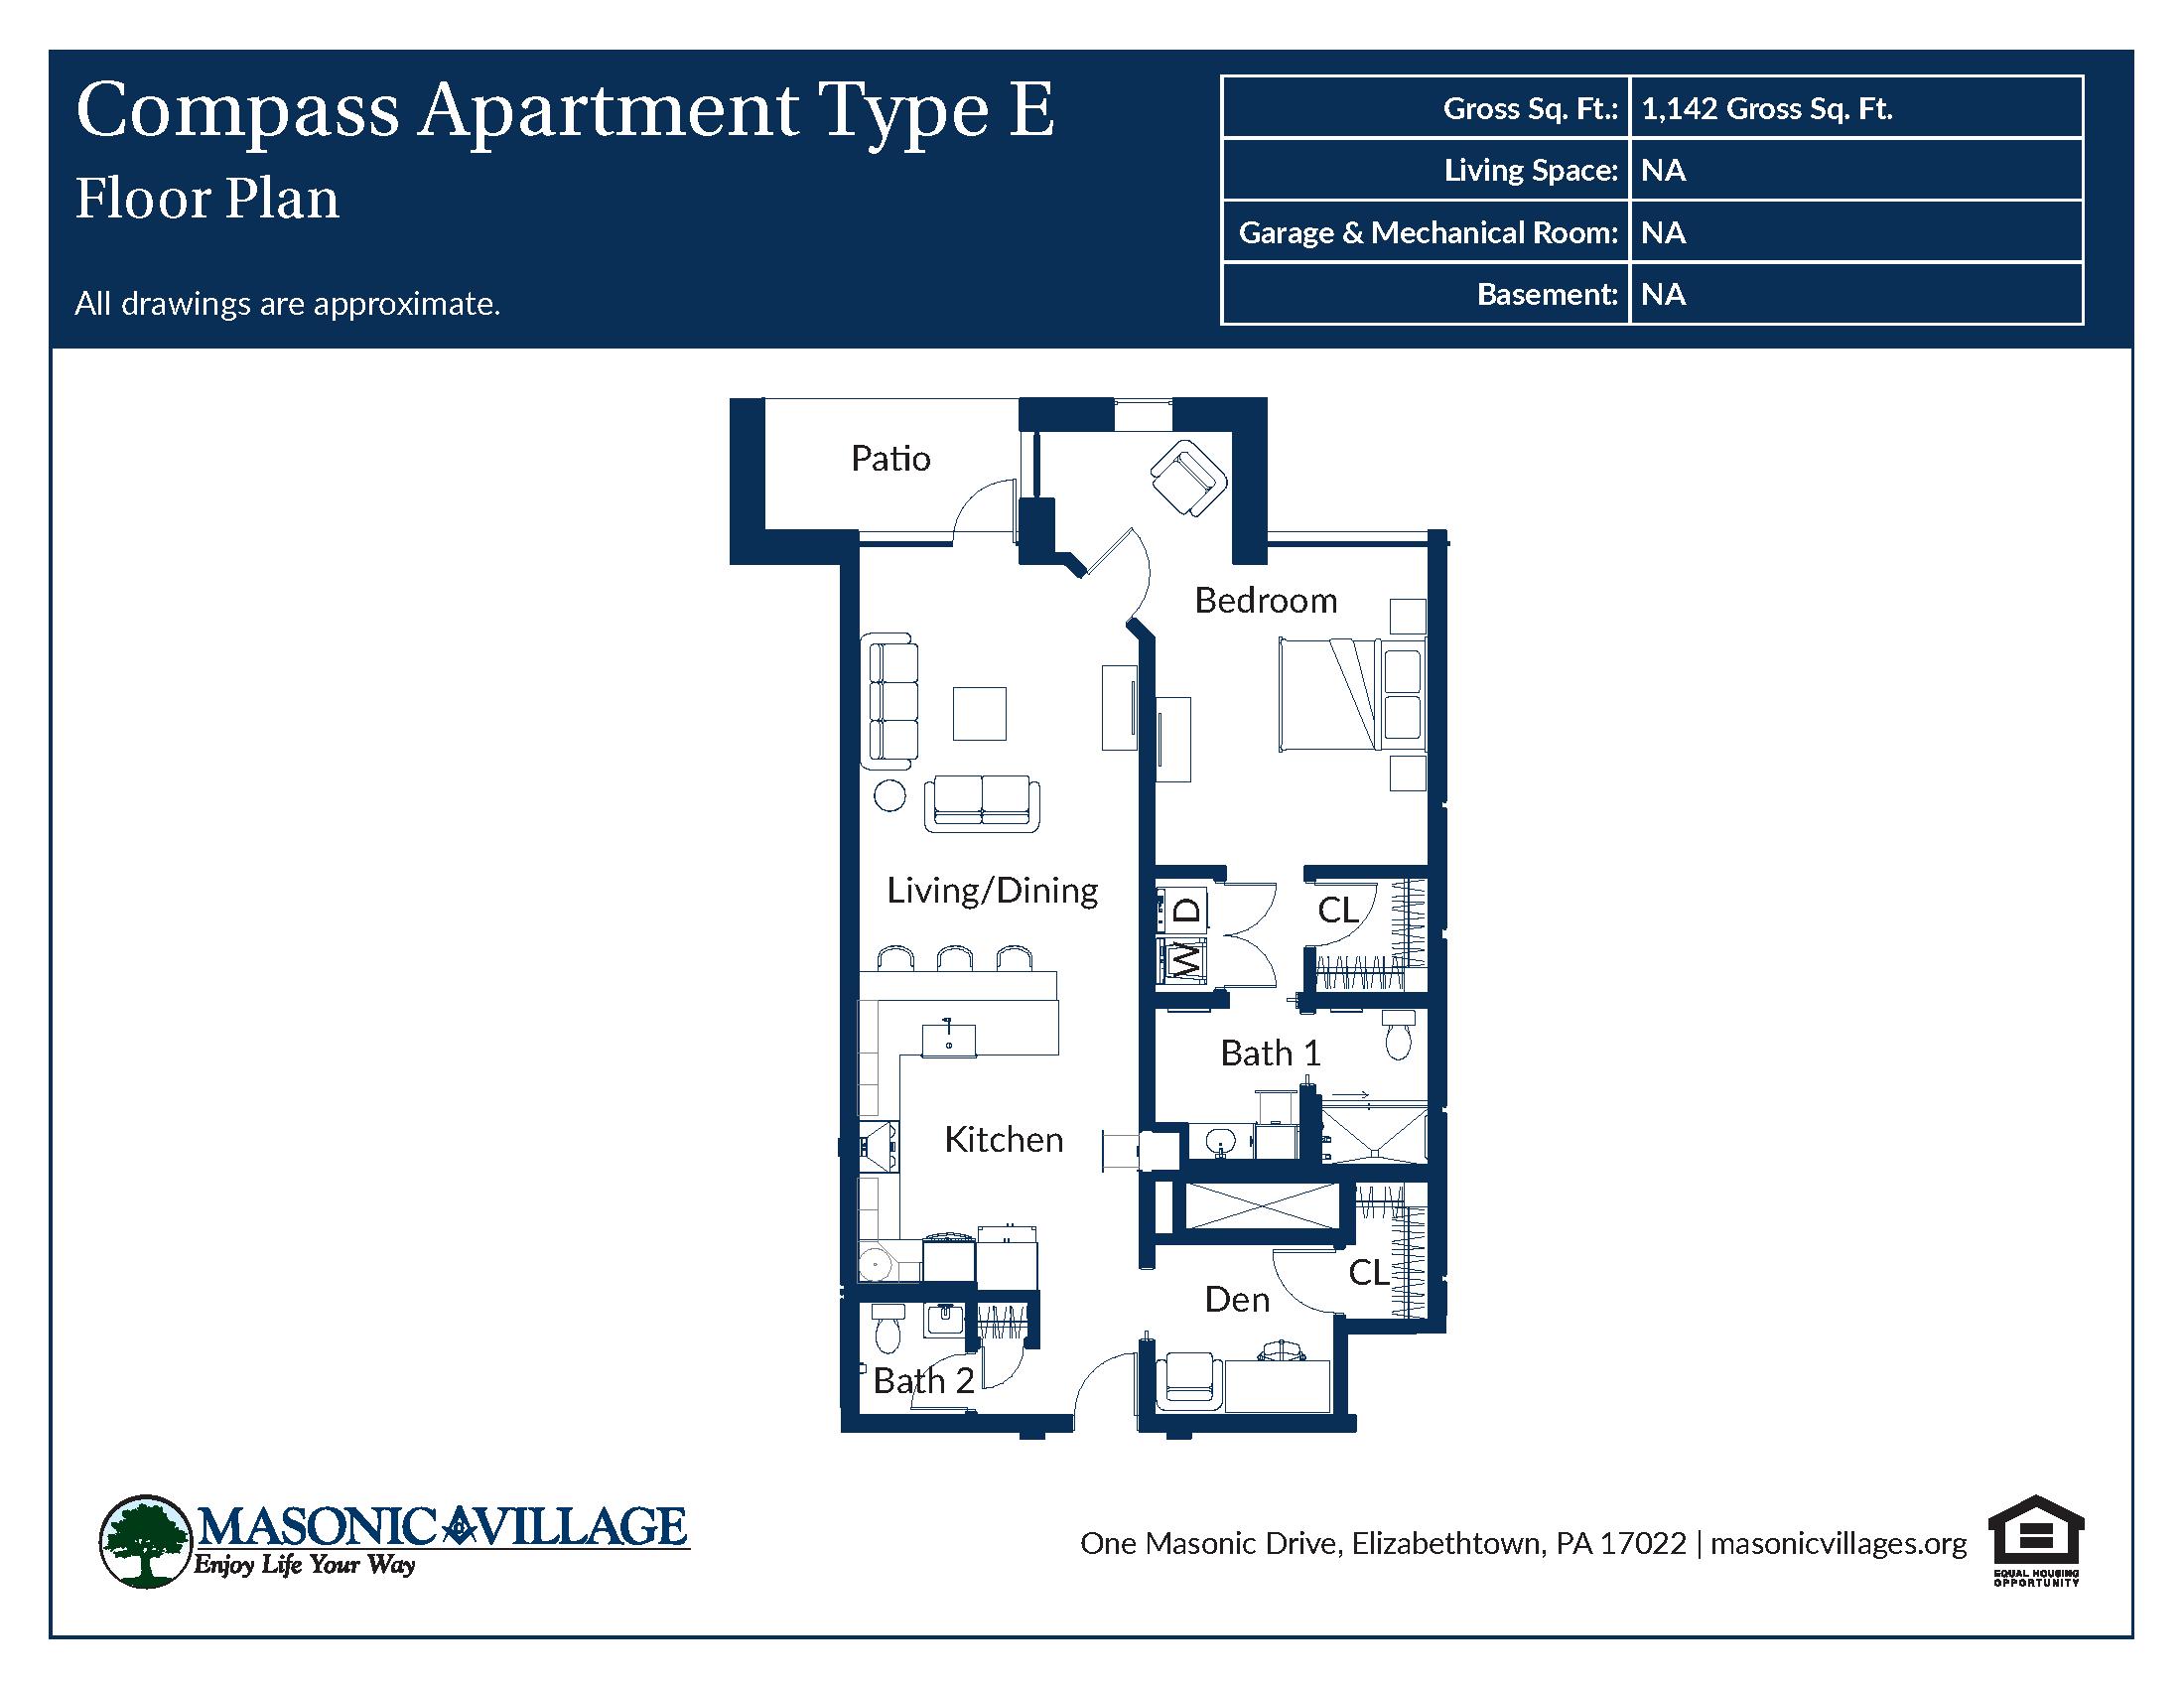 Masonic Village at Elizabethtown - Compass Apartment E Floor Plan